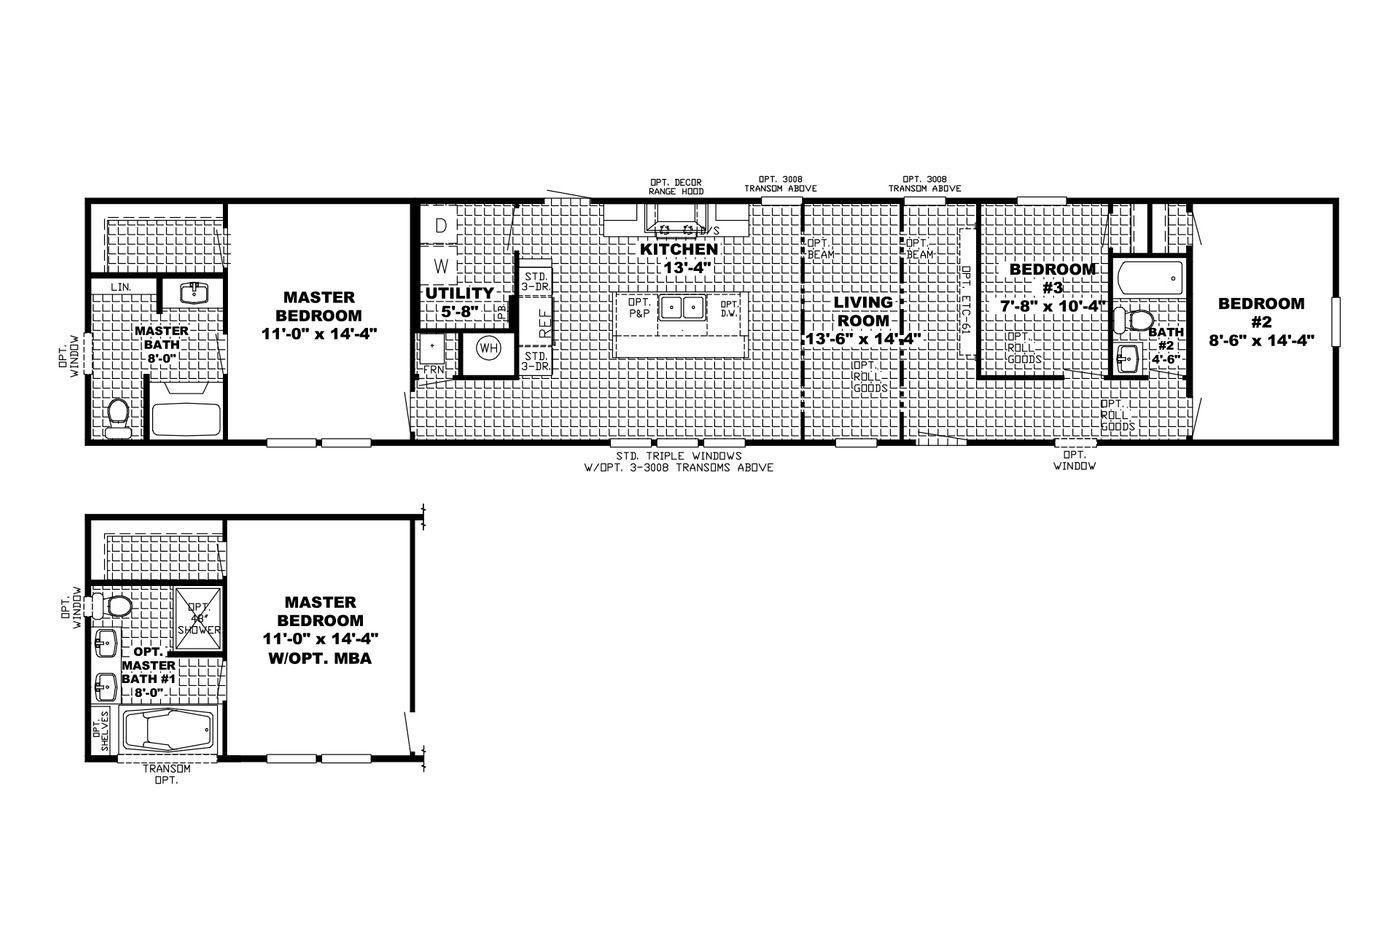 The Granite Ridge Floorplan